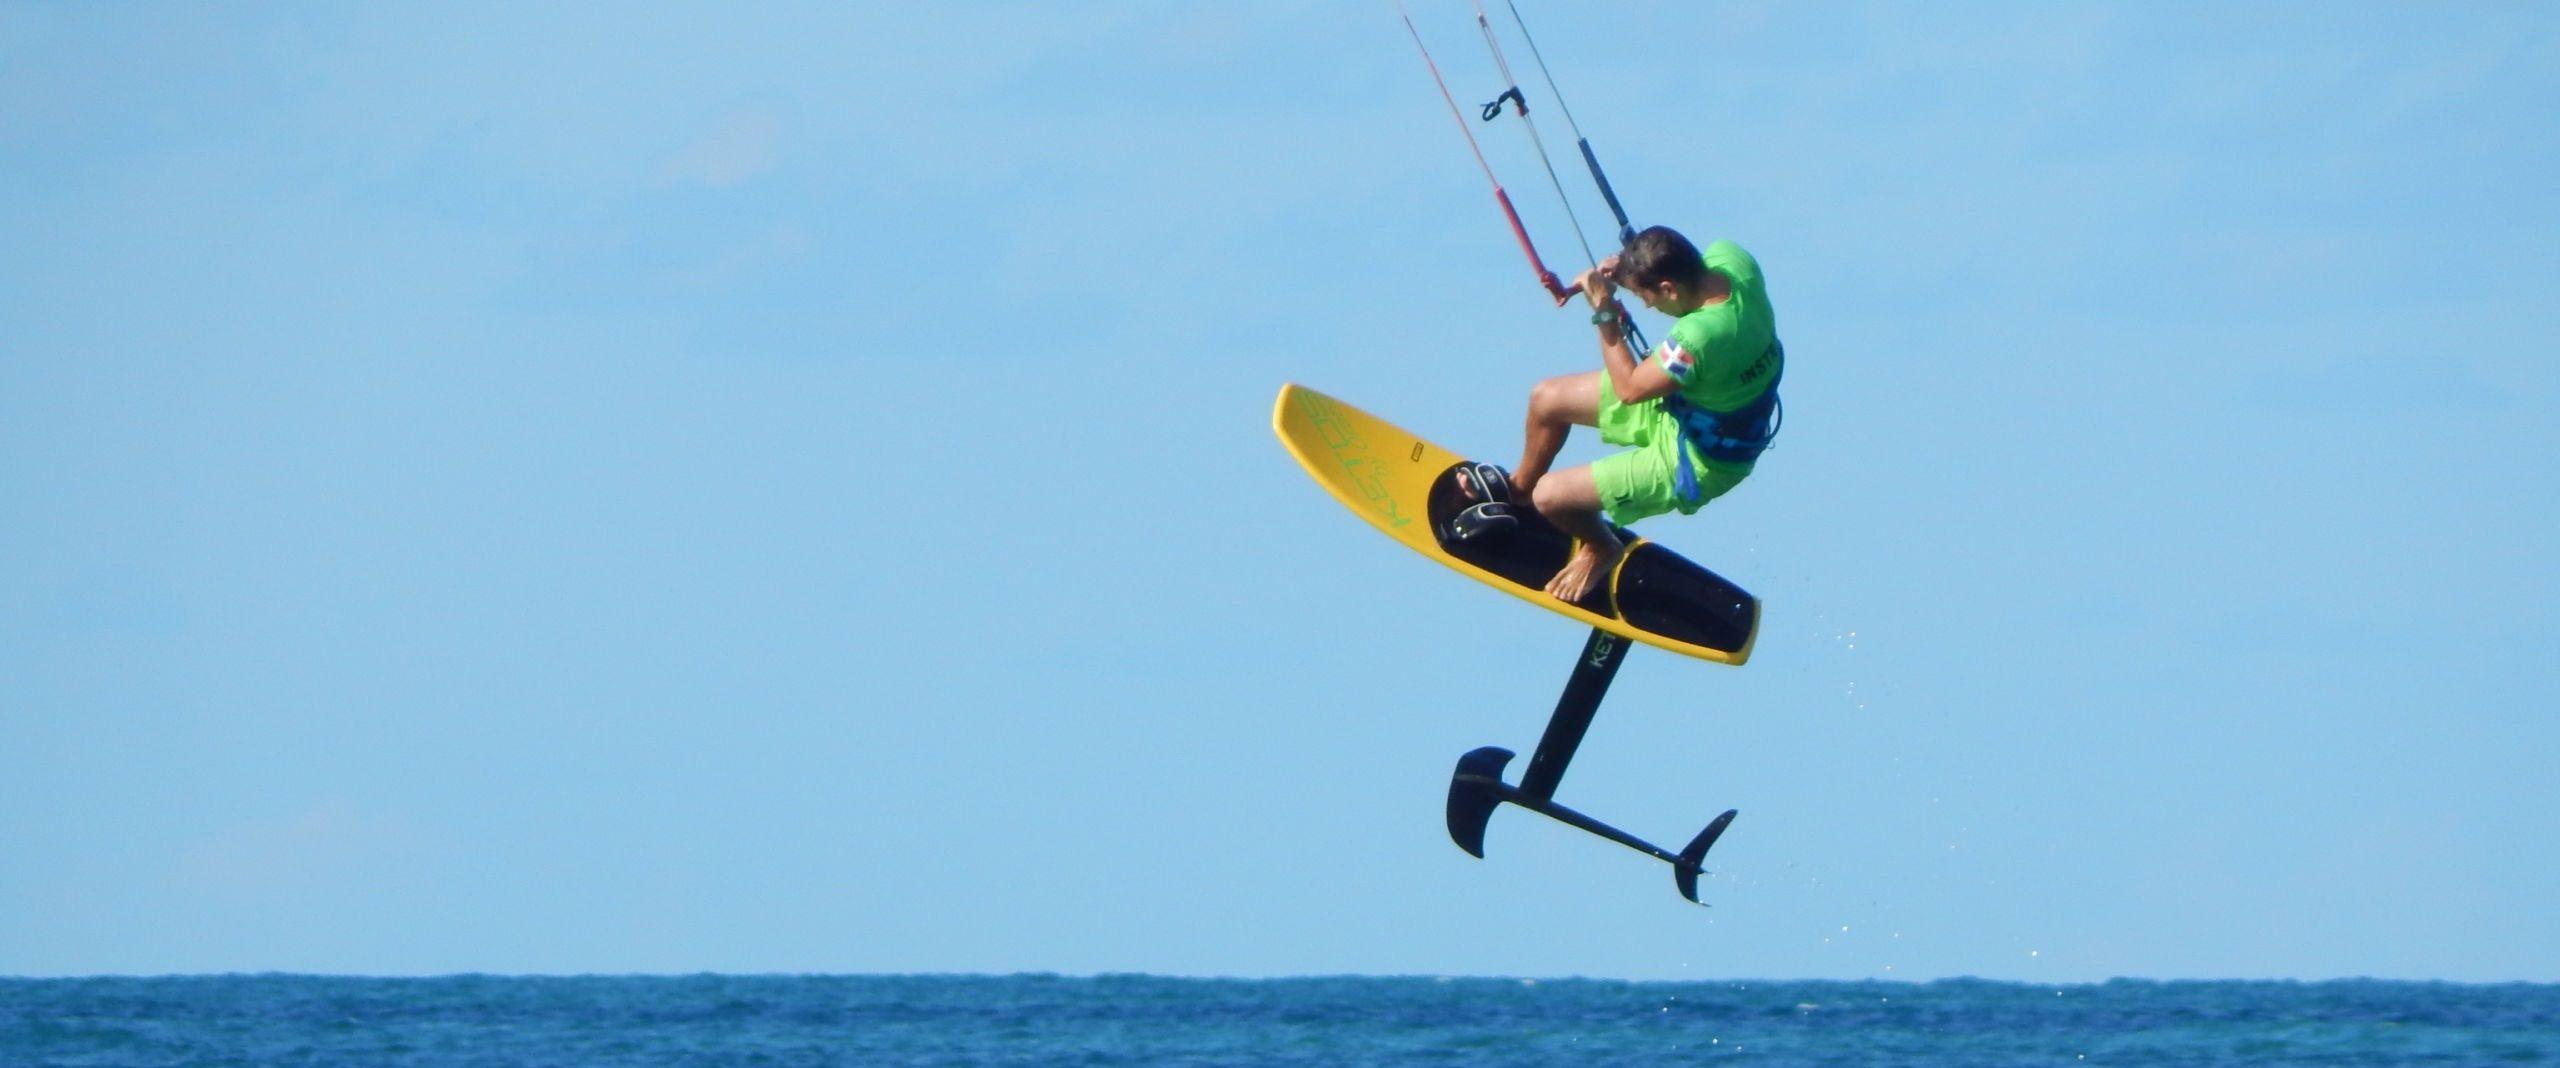 hydrofoil kitefoiling in las terrenas dominican republic